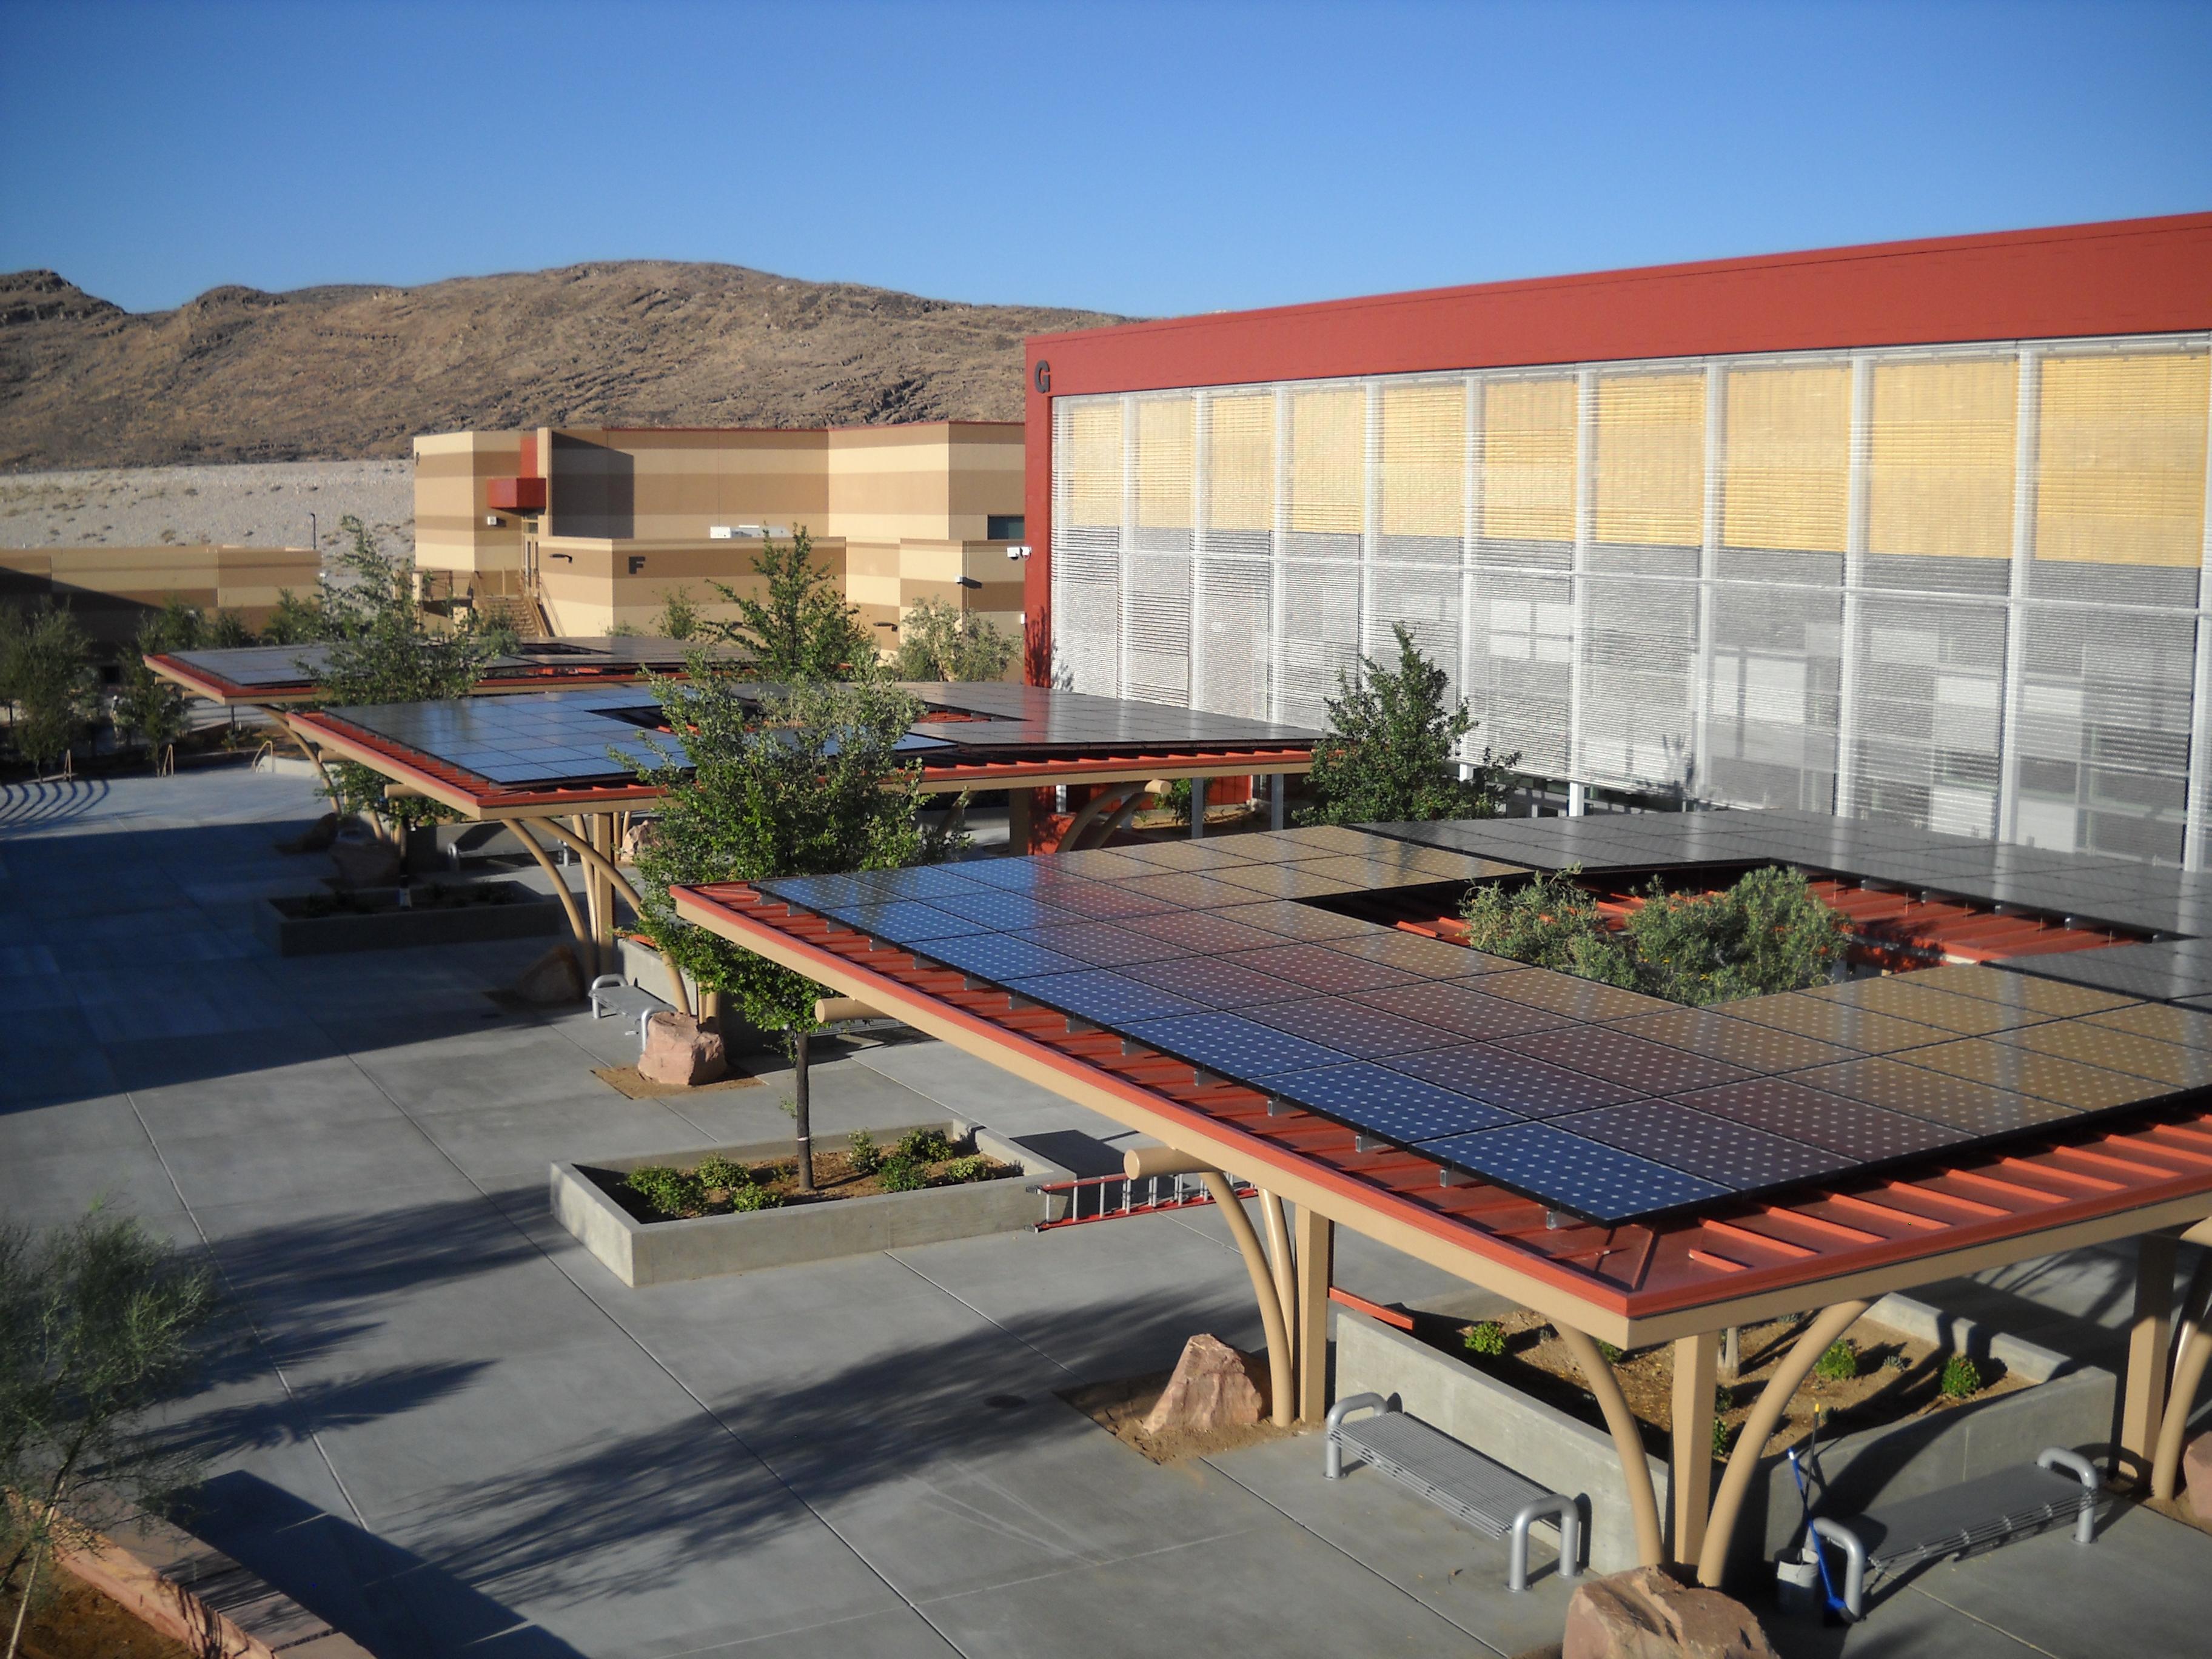 West Career and Technical Academy Las Vegas